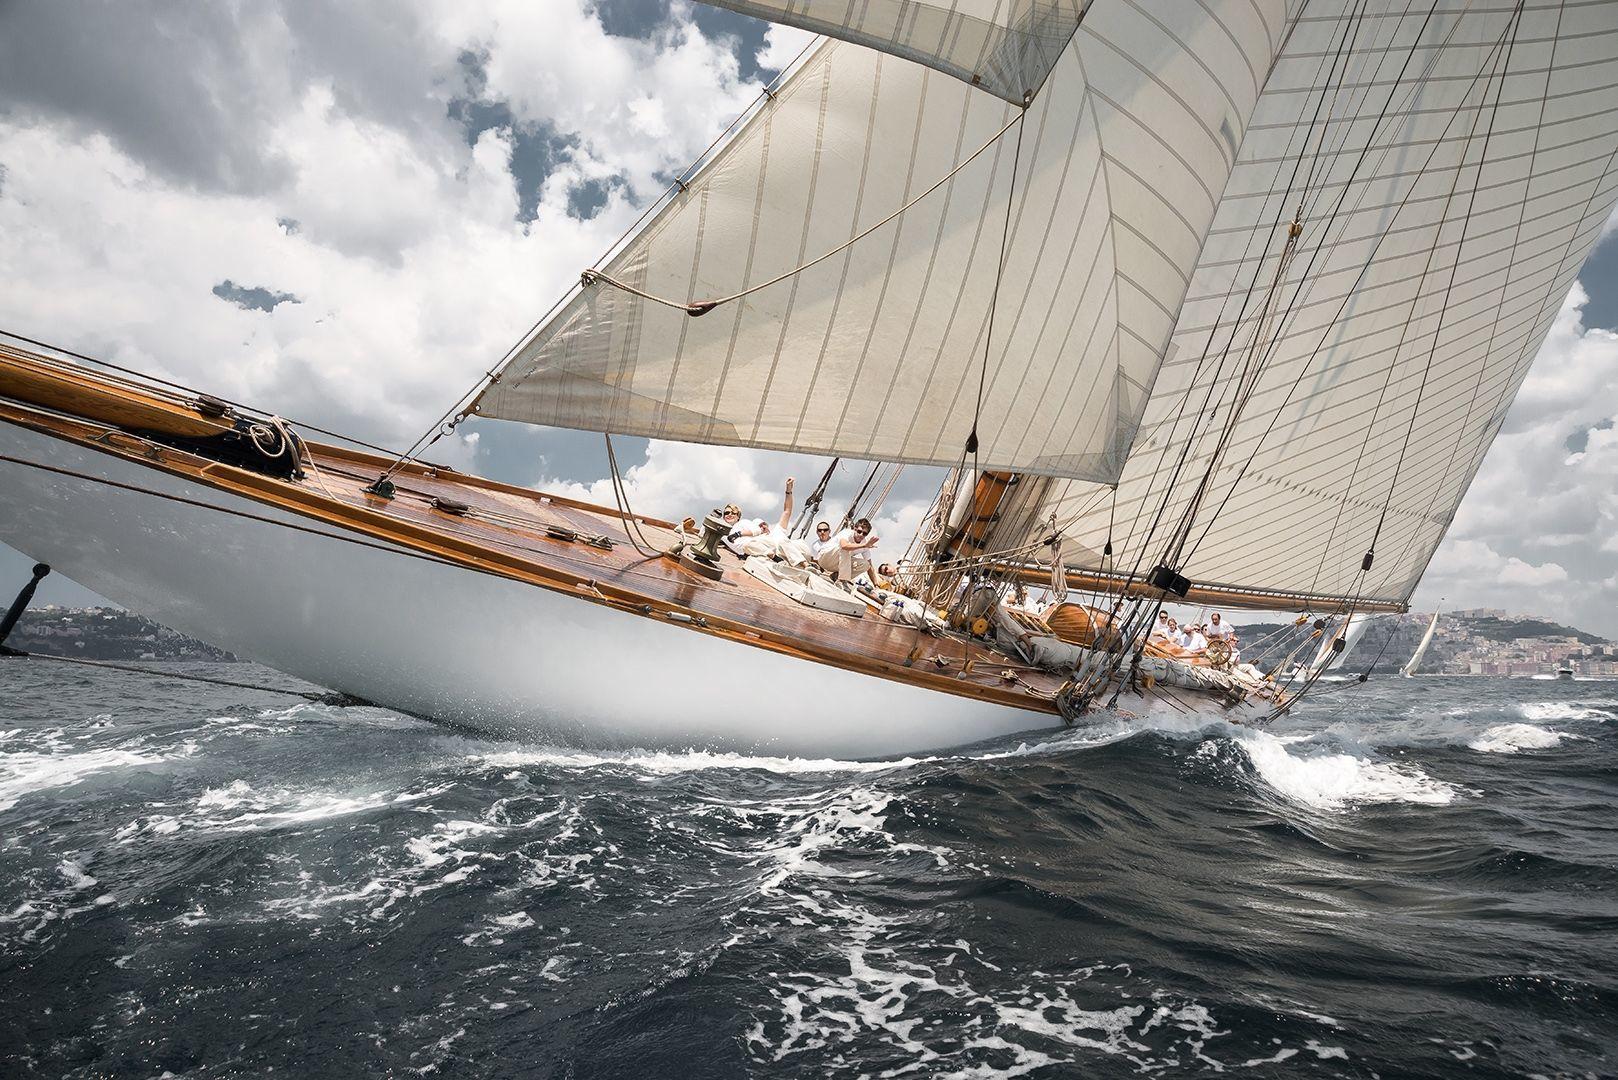 vele d epoca trofeo panerai 5 vela di angelo florio fotografo pubblicitario sailing race napoli roma